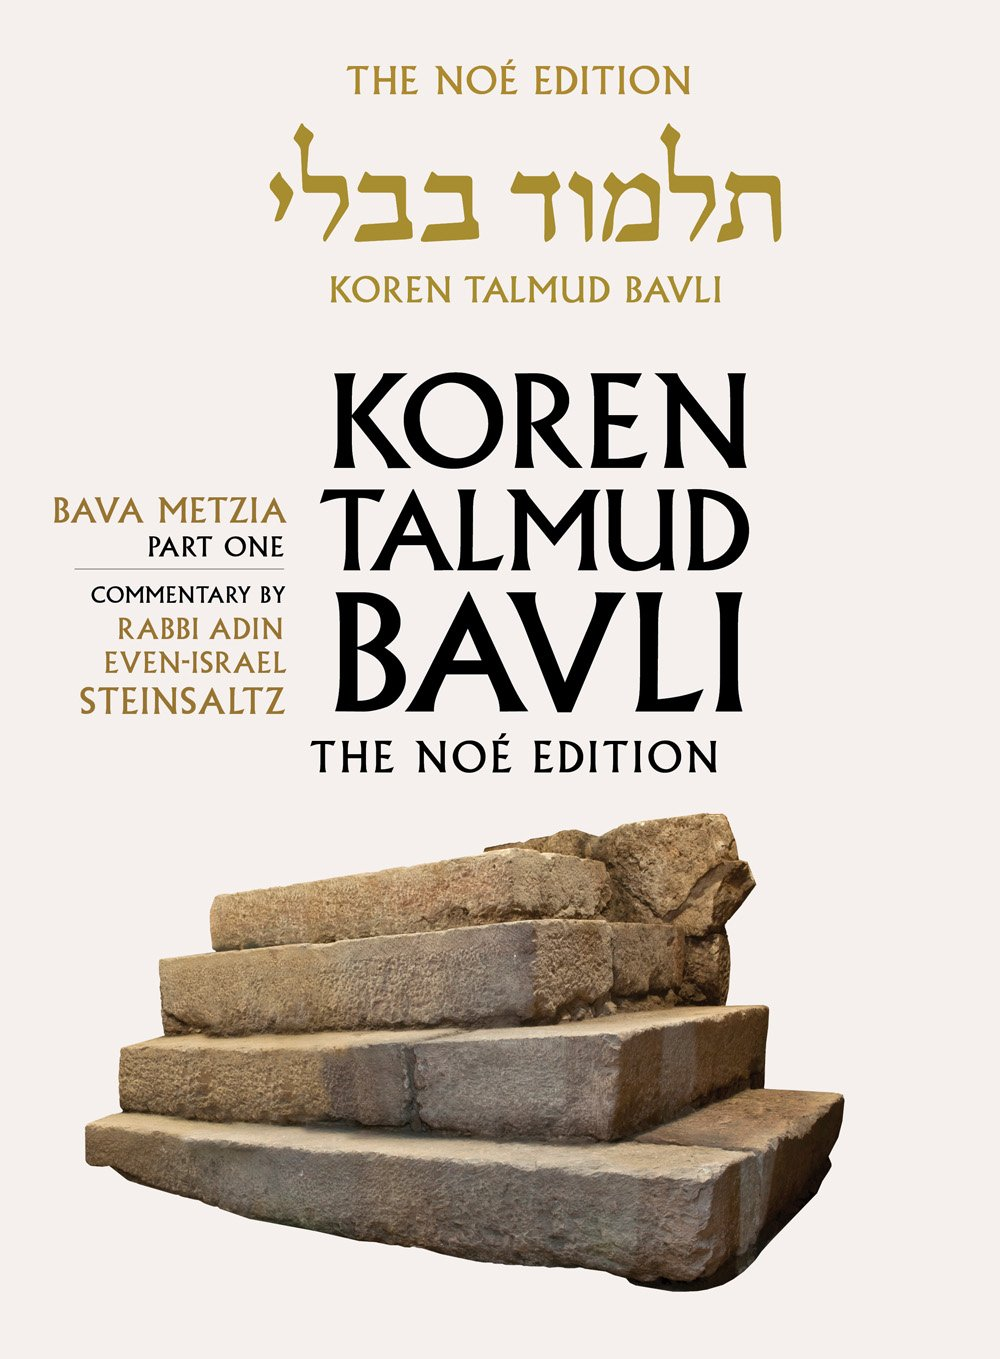 Koren Talmud Bavli Noe Vol 25  Bava Metzia Part 1 Hebrew English Large Color Edition  Koren Talmud Bavli The Noé Edition